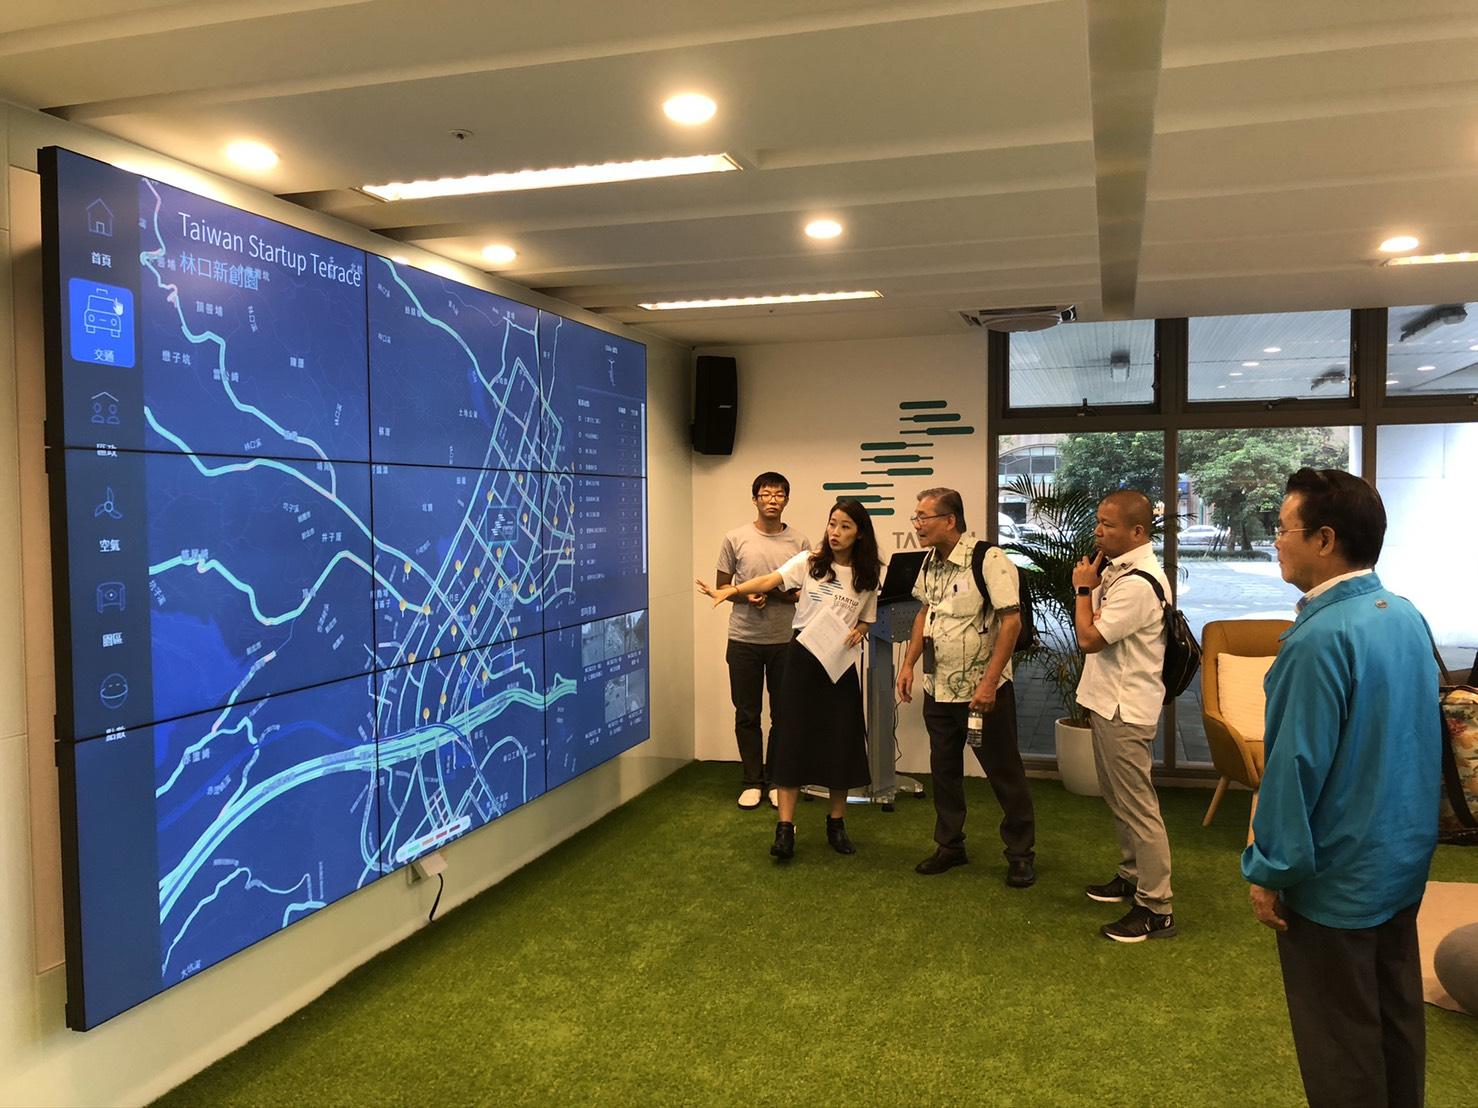 Orientation tour in Startup Terrace